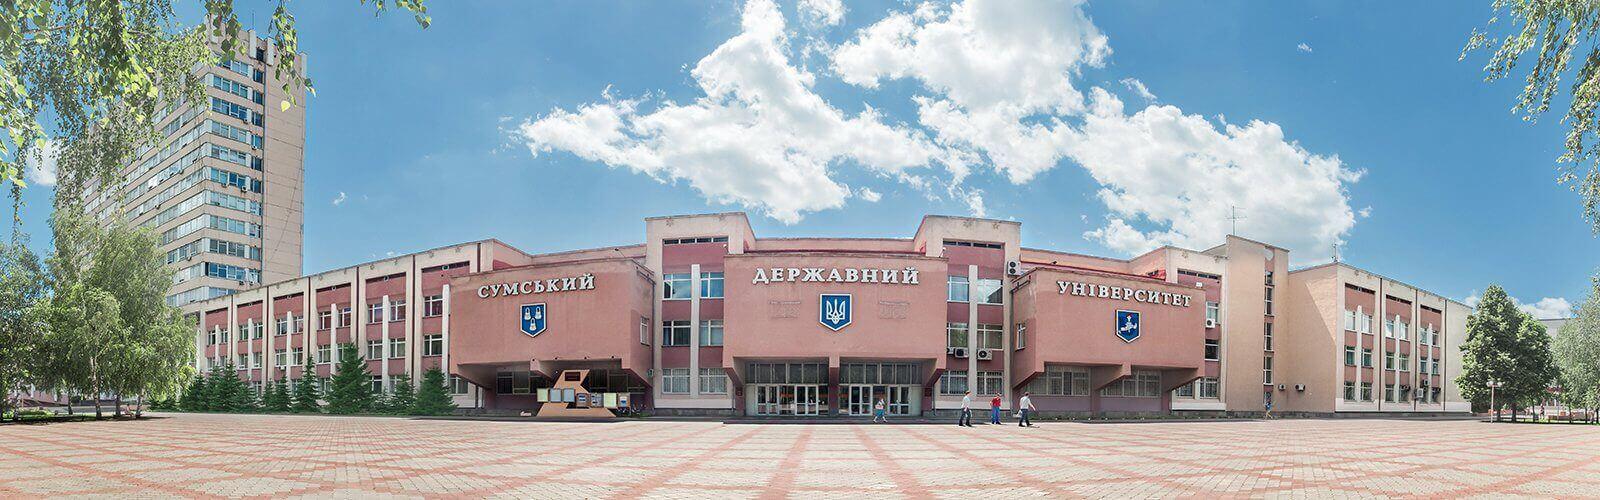 Sumy Tarım Üniversitesi /Sumy National Agrarian University